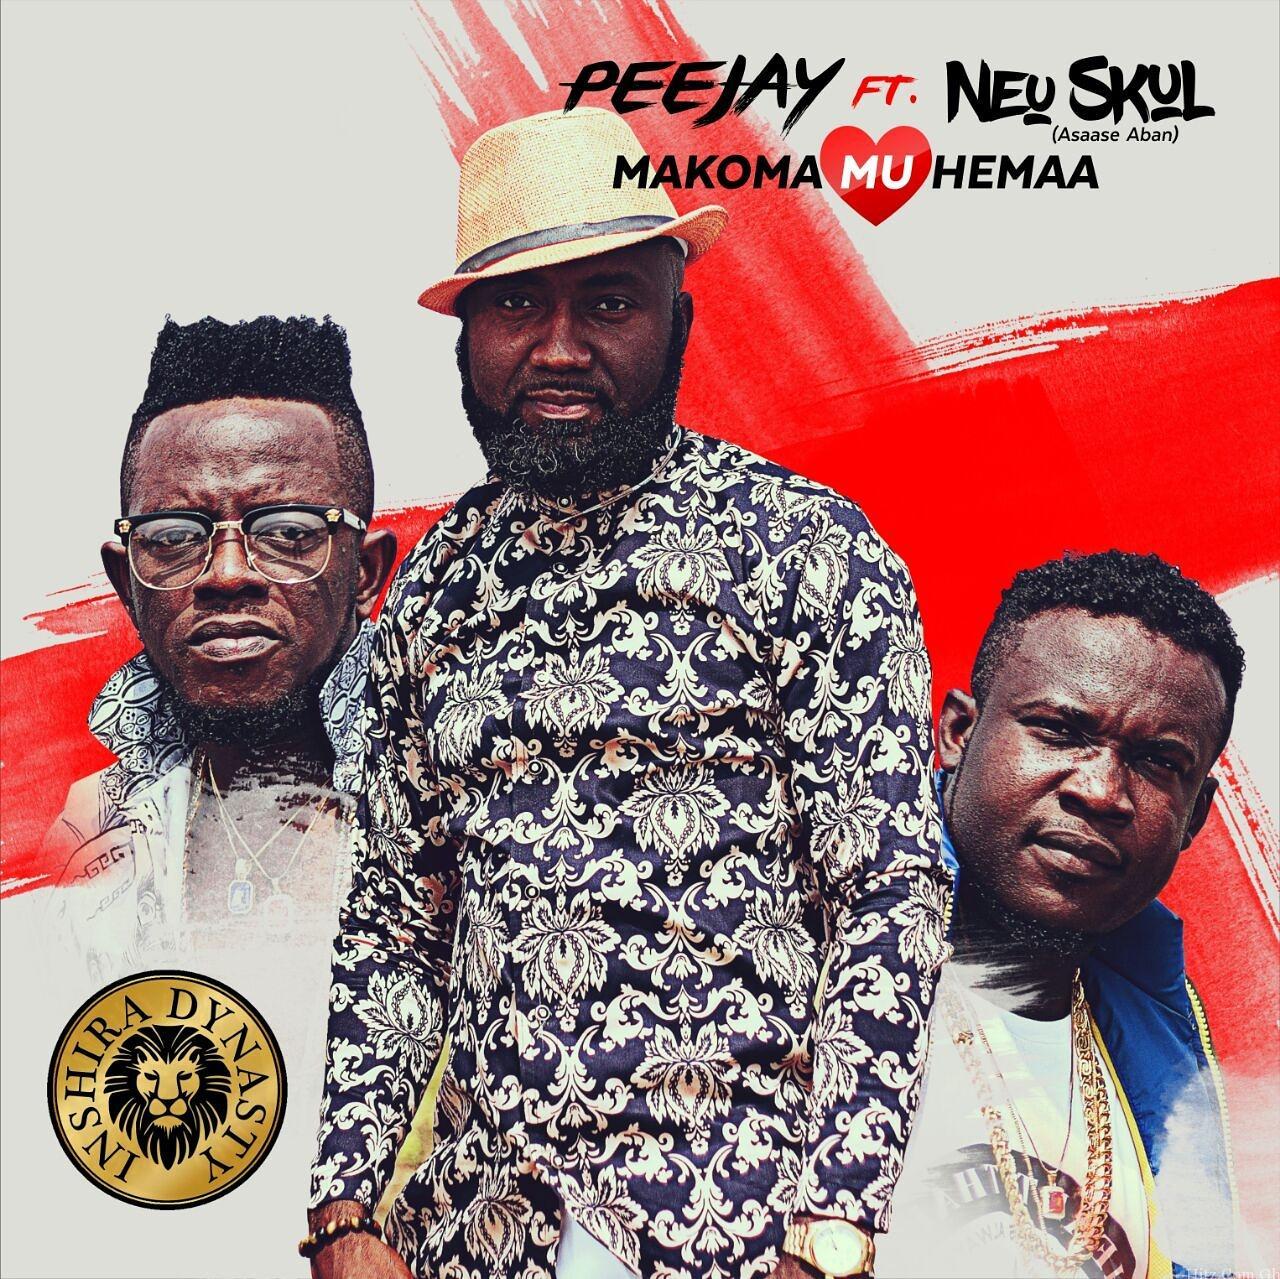 Peejay - Makomamu Hemaa Feat. Neu Skul (Asaase Aban)